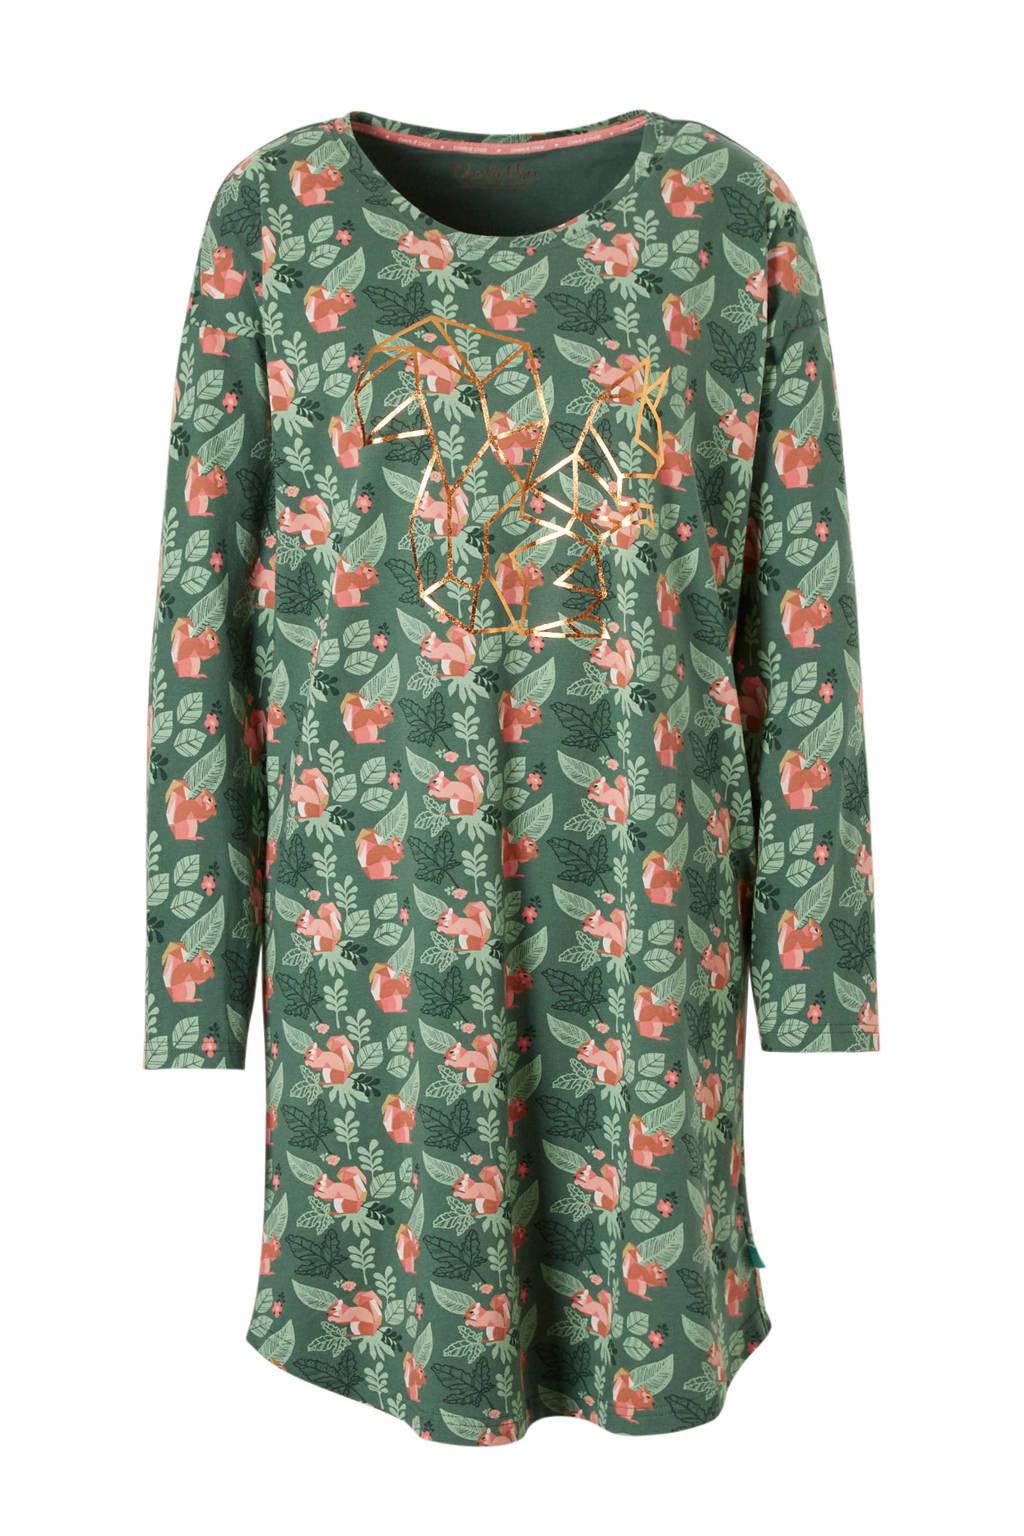 Charlie Choe nachthemd in all over print groen, Groen/Roze/Bruin